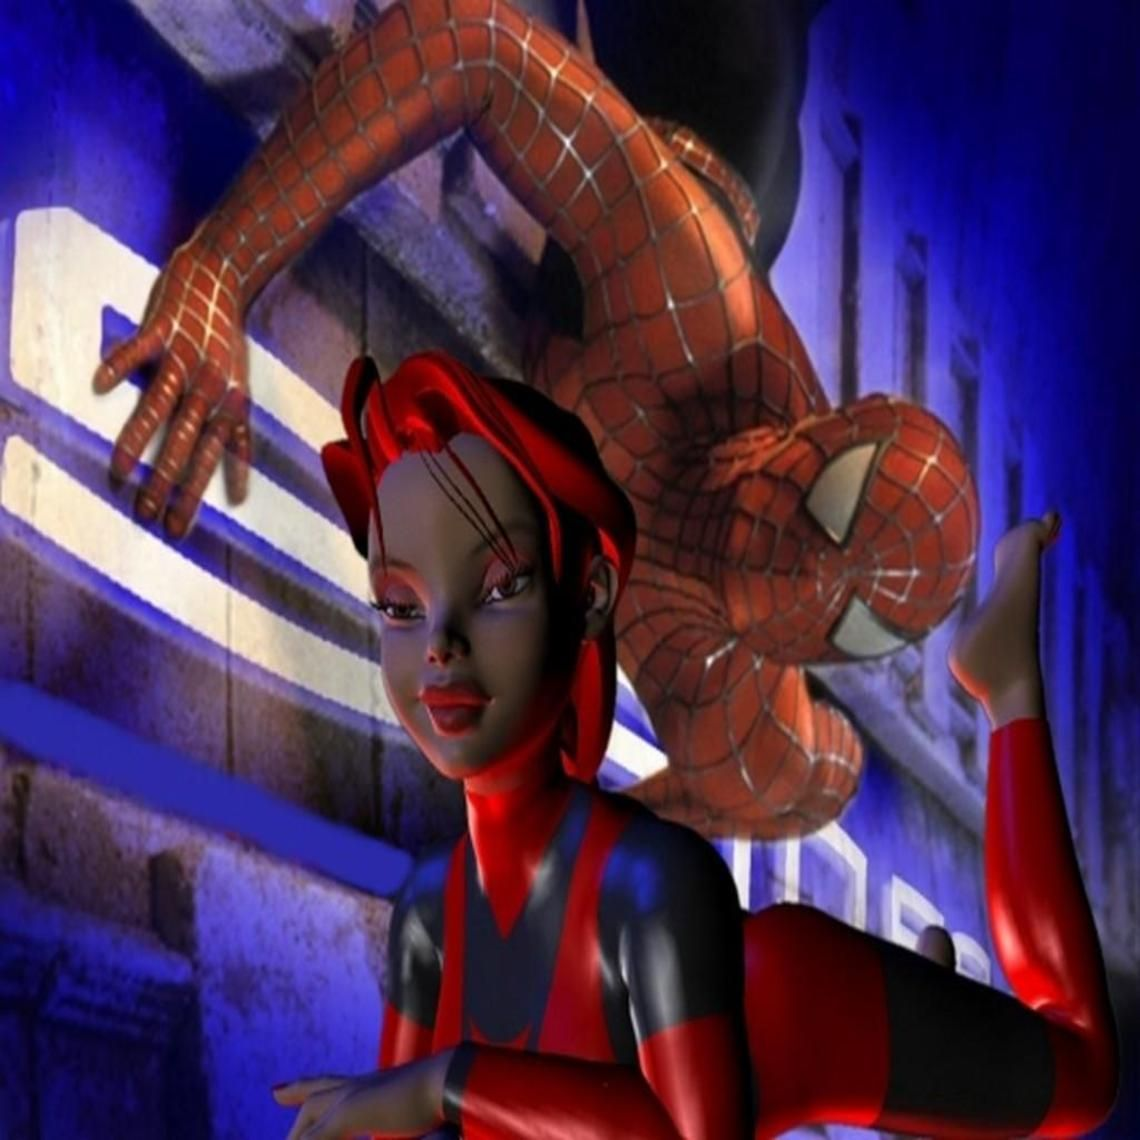 thinking of spiderman